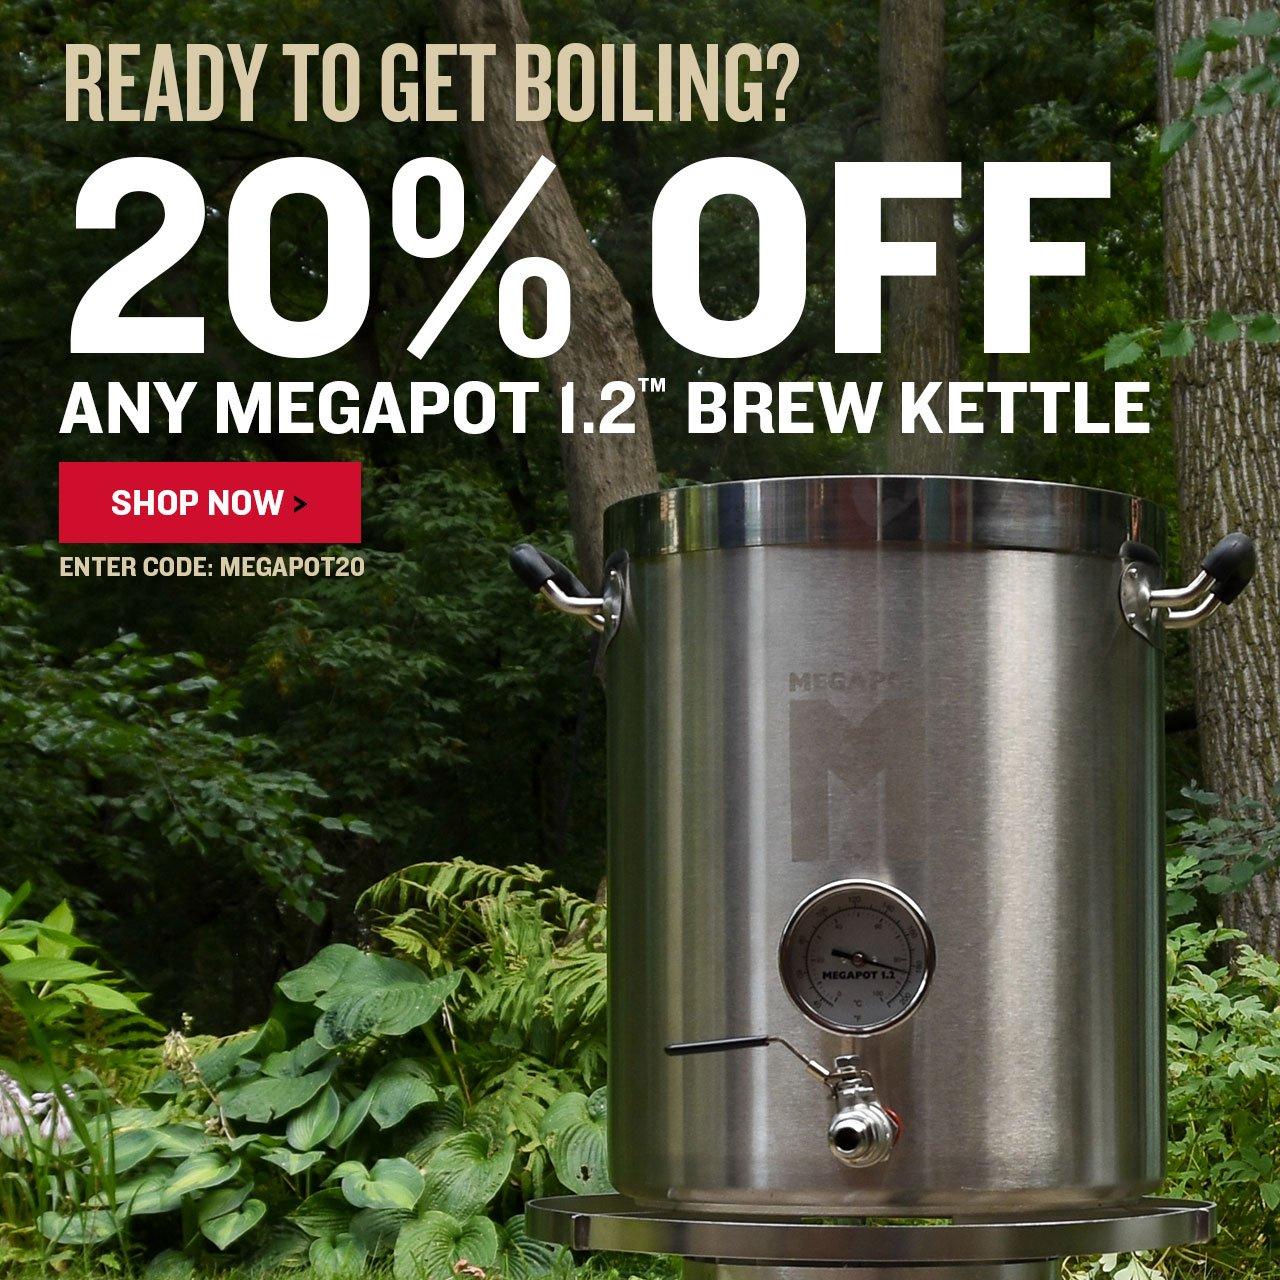 Take 20% Off Megapot Staineless Steel Kettles. Promo Code: MEGAPOT20